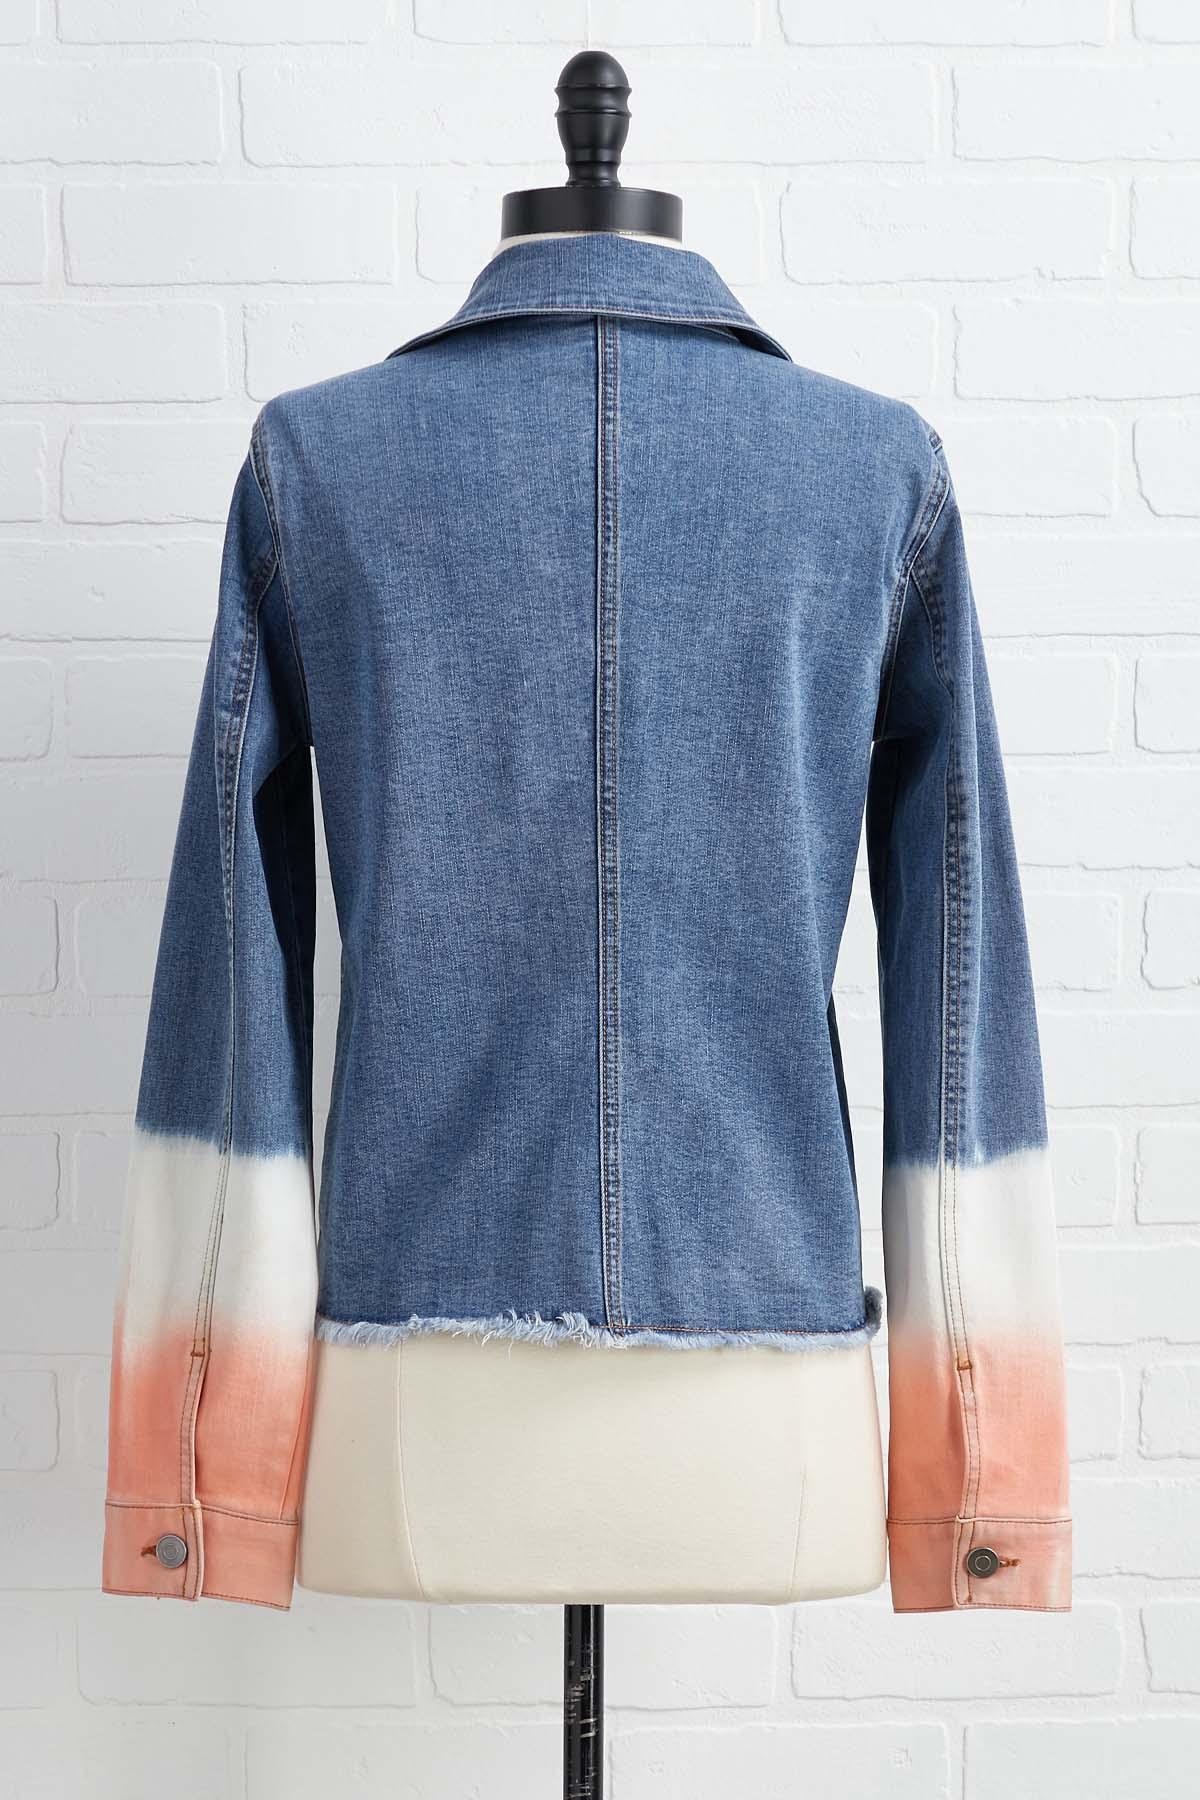 Peachy Keen Jacket